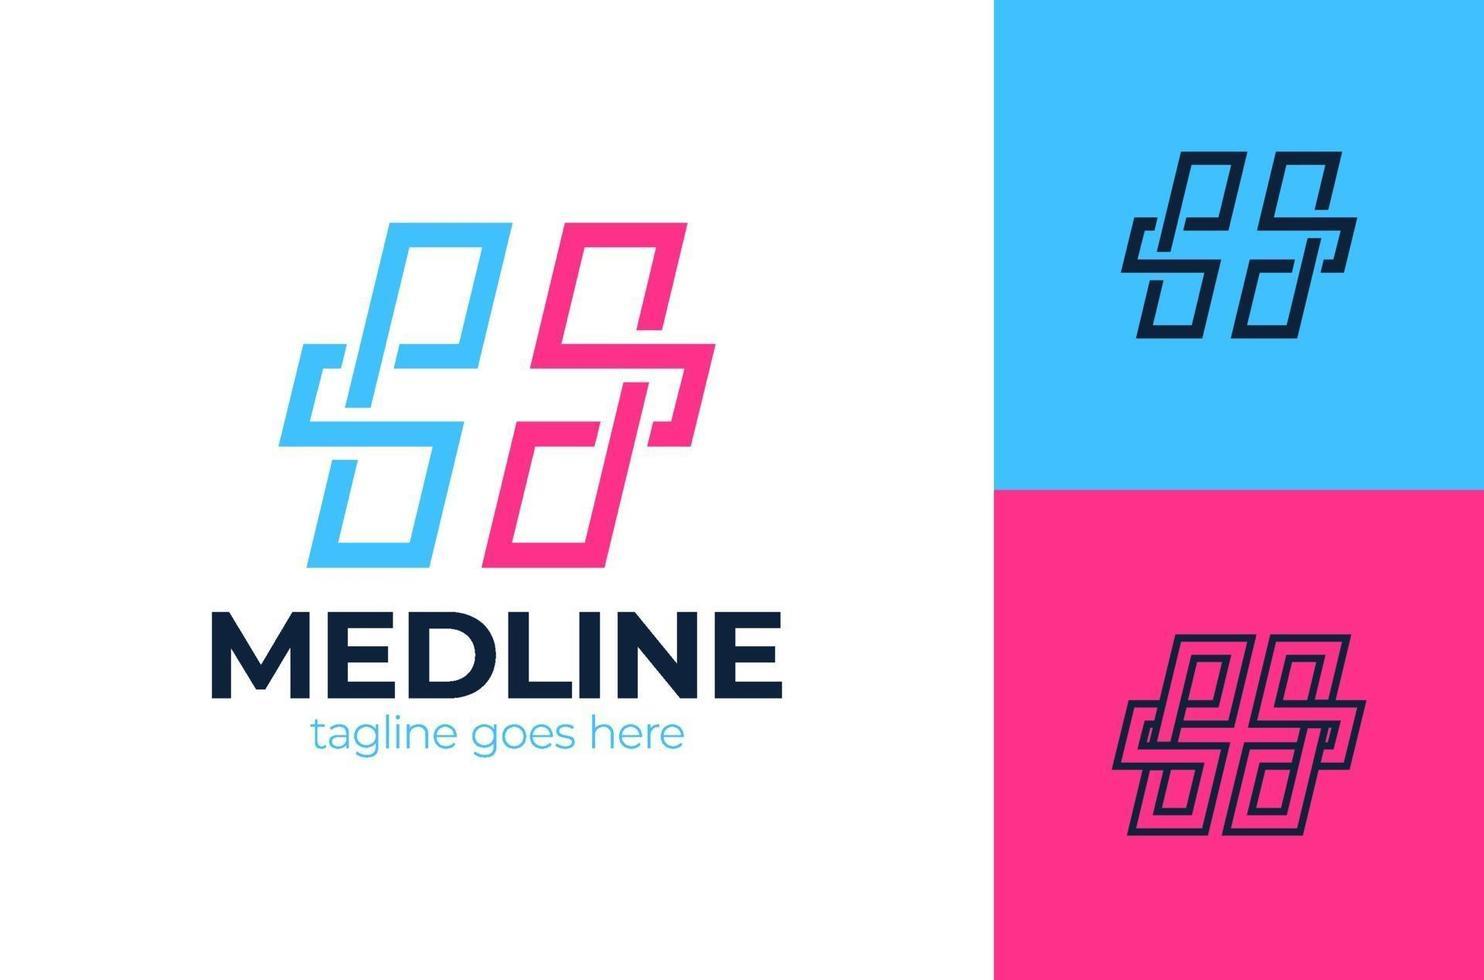 modelo de design de logotipo de conceito de saúde criativa. elementos de modelo de design de ícone de logotipo médico cross plus vetor